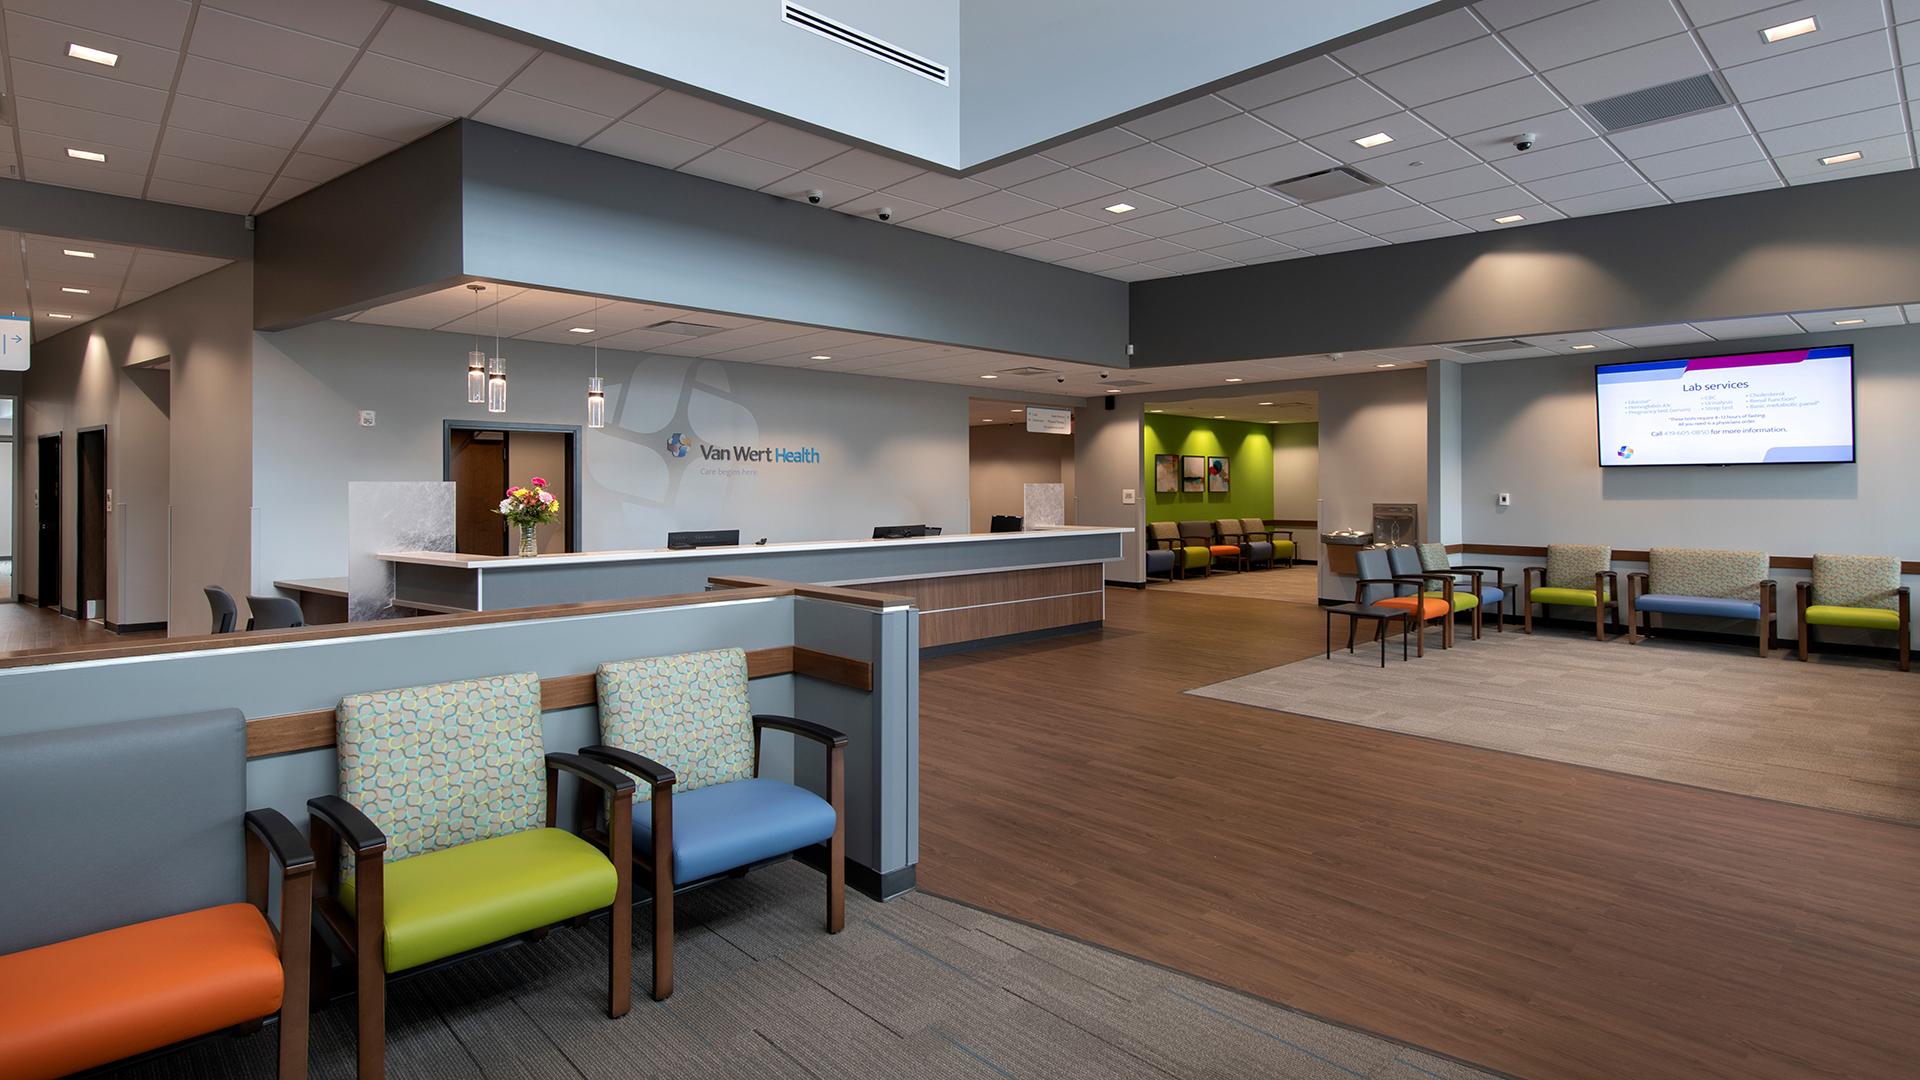 Van Wert Health - Interior Photo, Waiting Area Interior Design